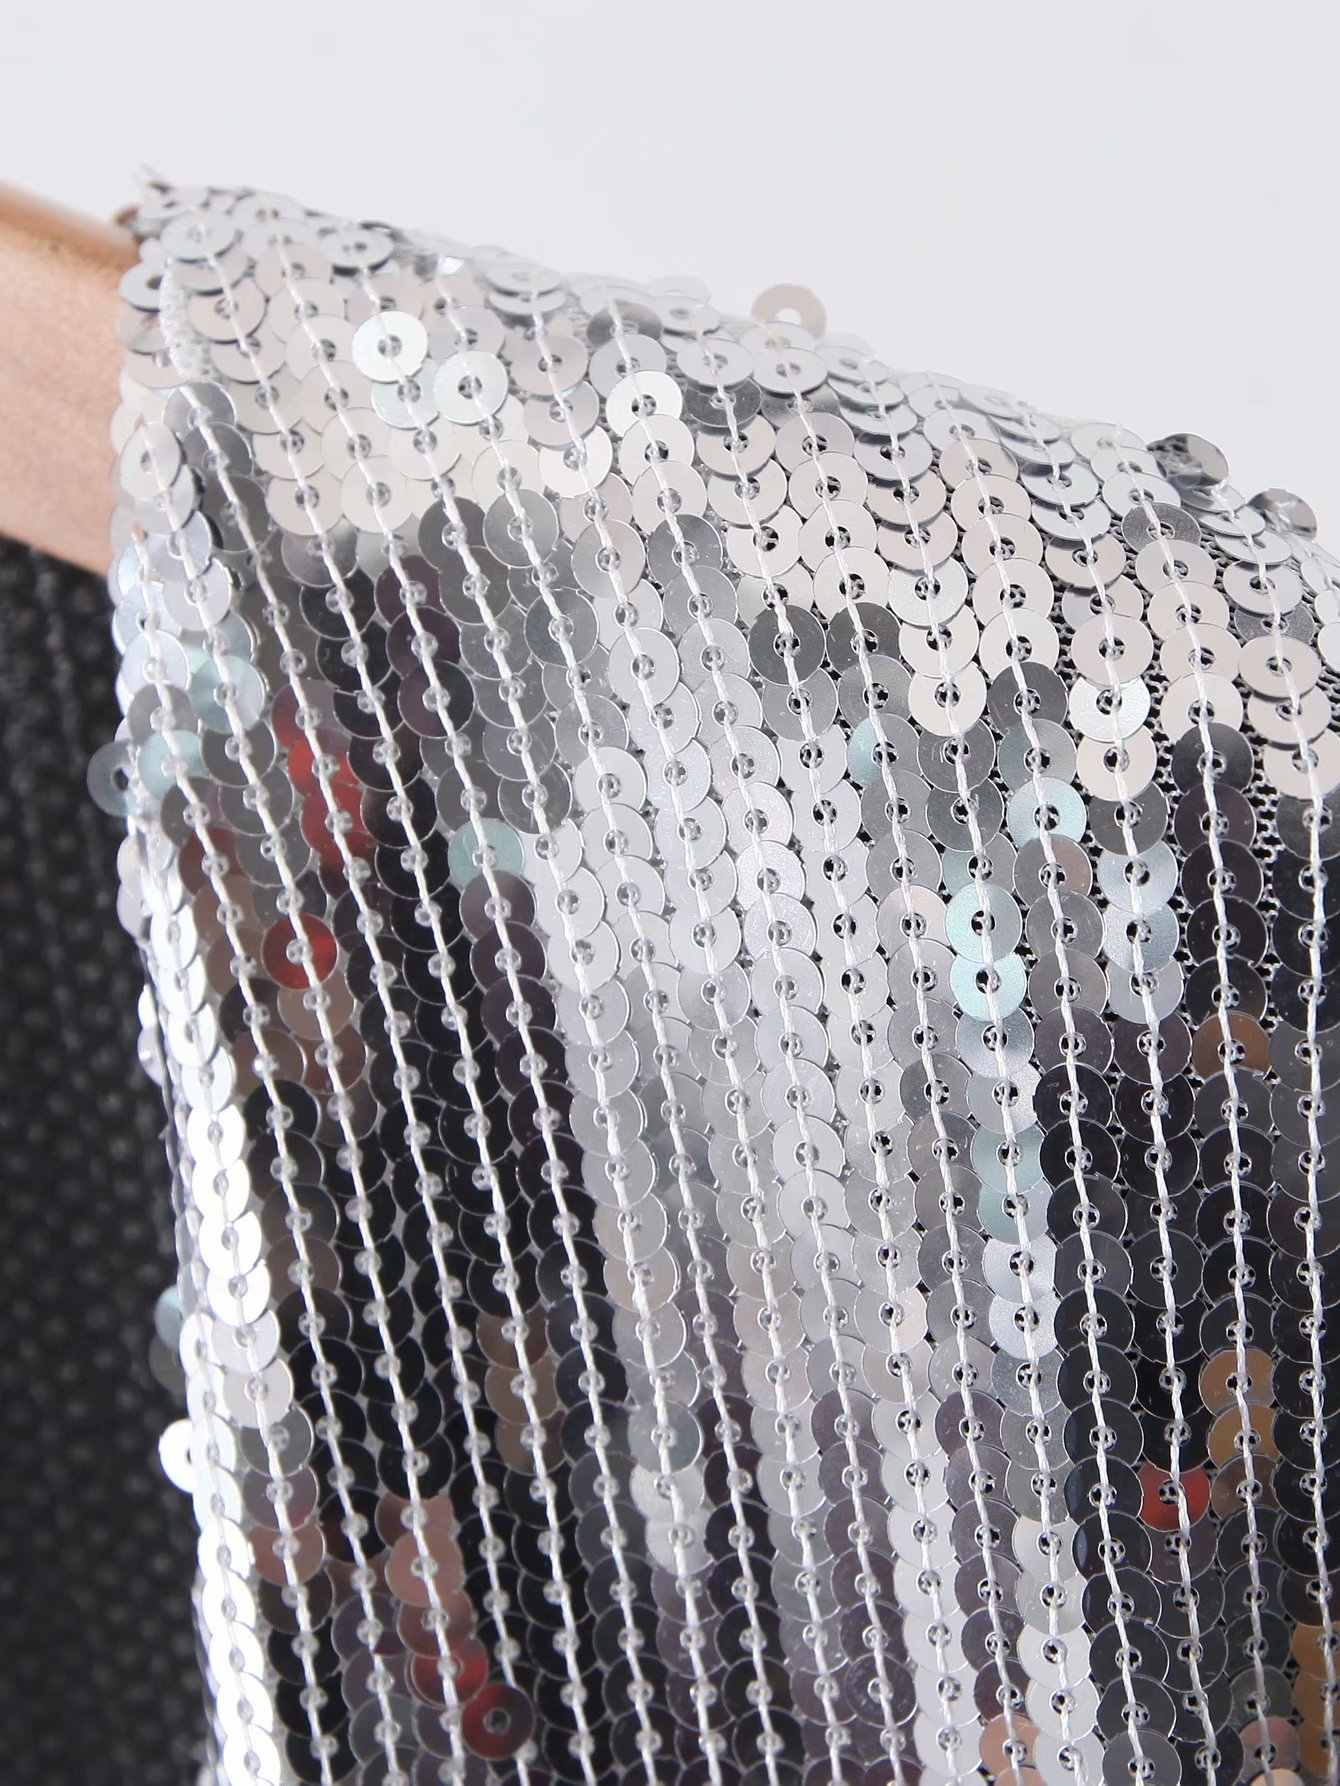 Sliver Berpayet Panjang Jaket Harajuku Cardigan Mantel High Street Rumbai Jaket 2020 Wanita Pakaian